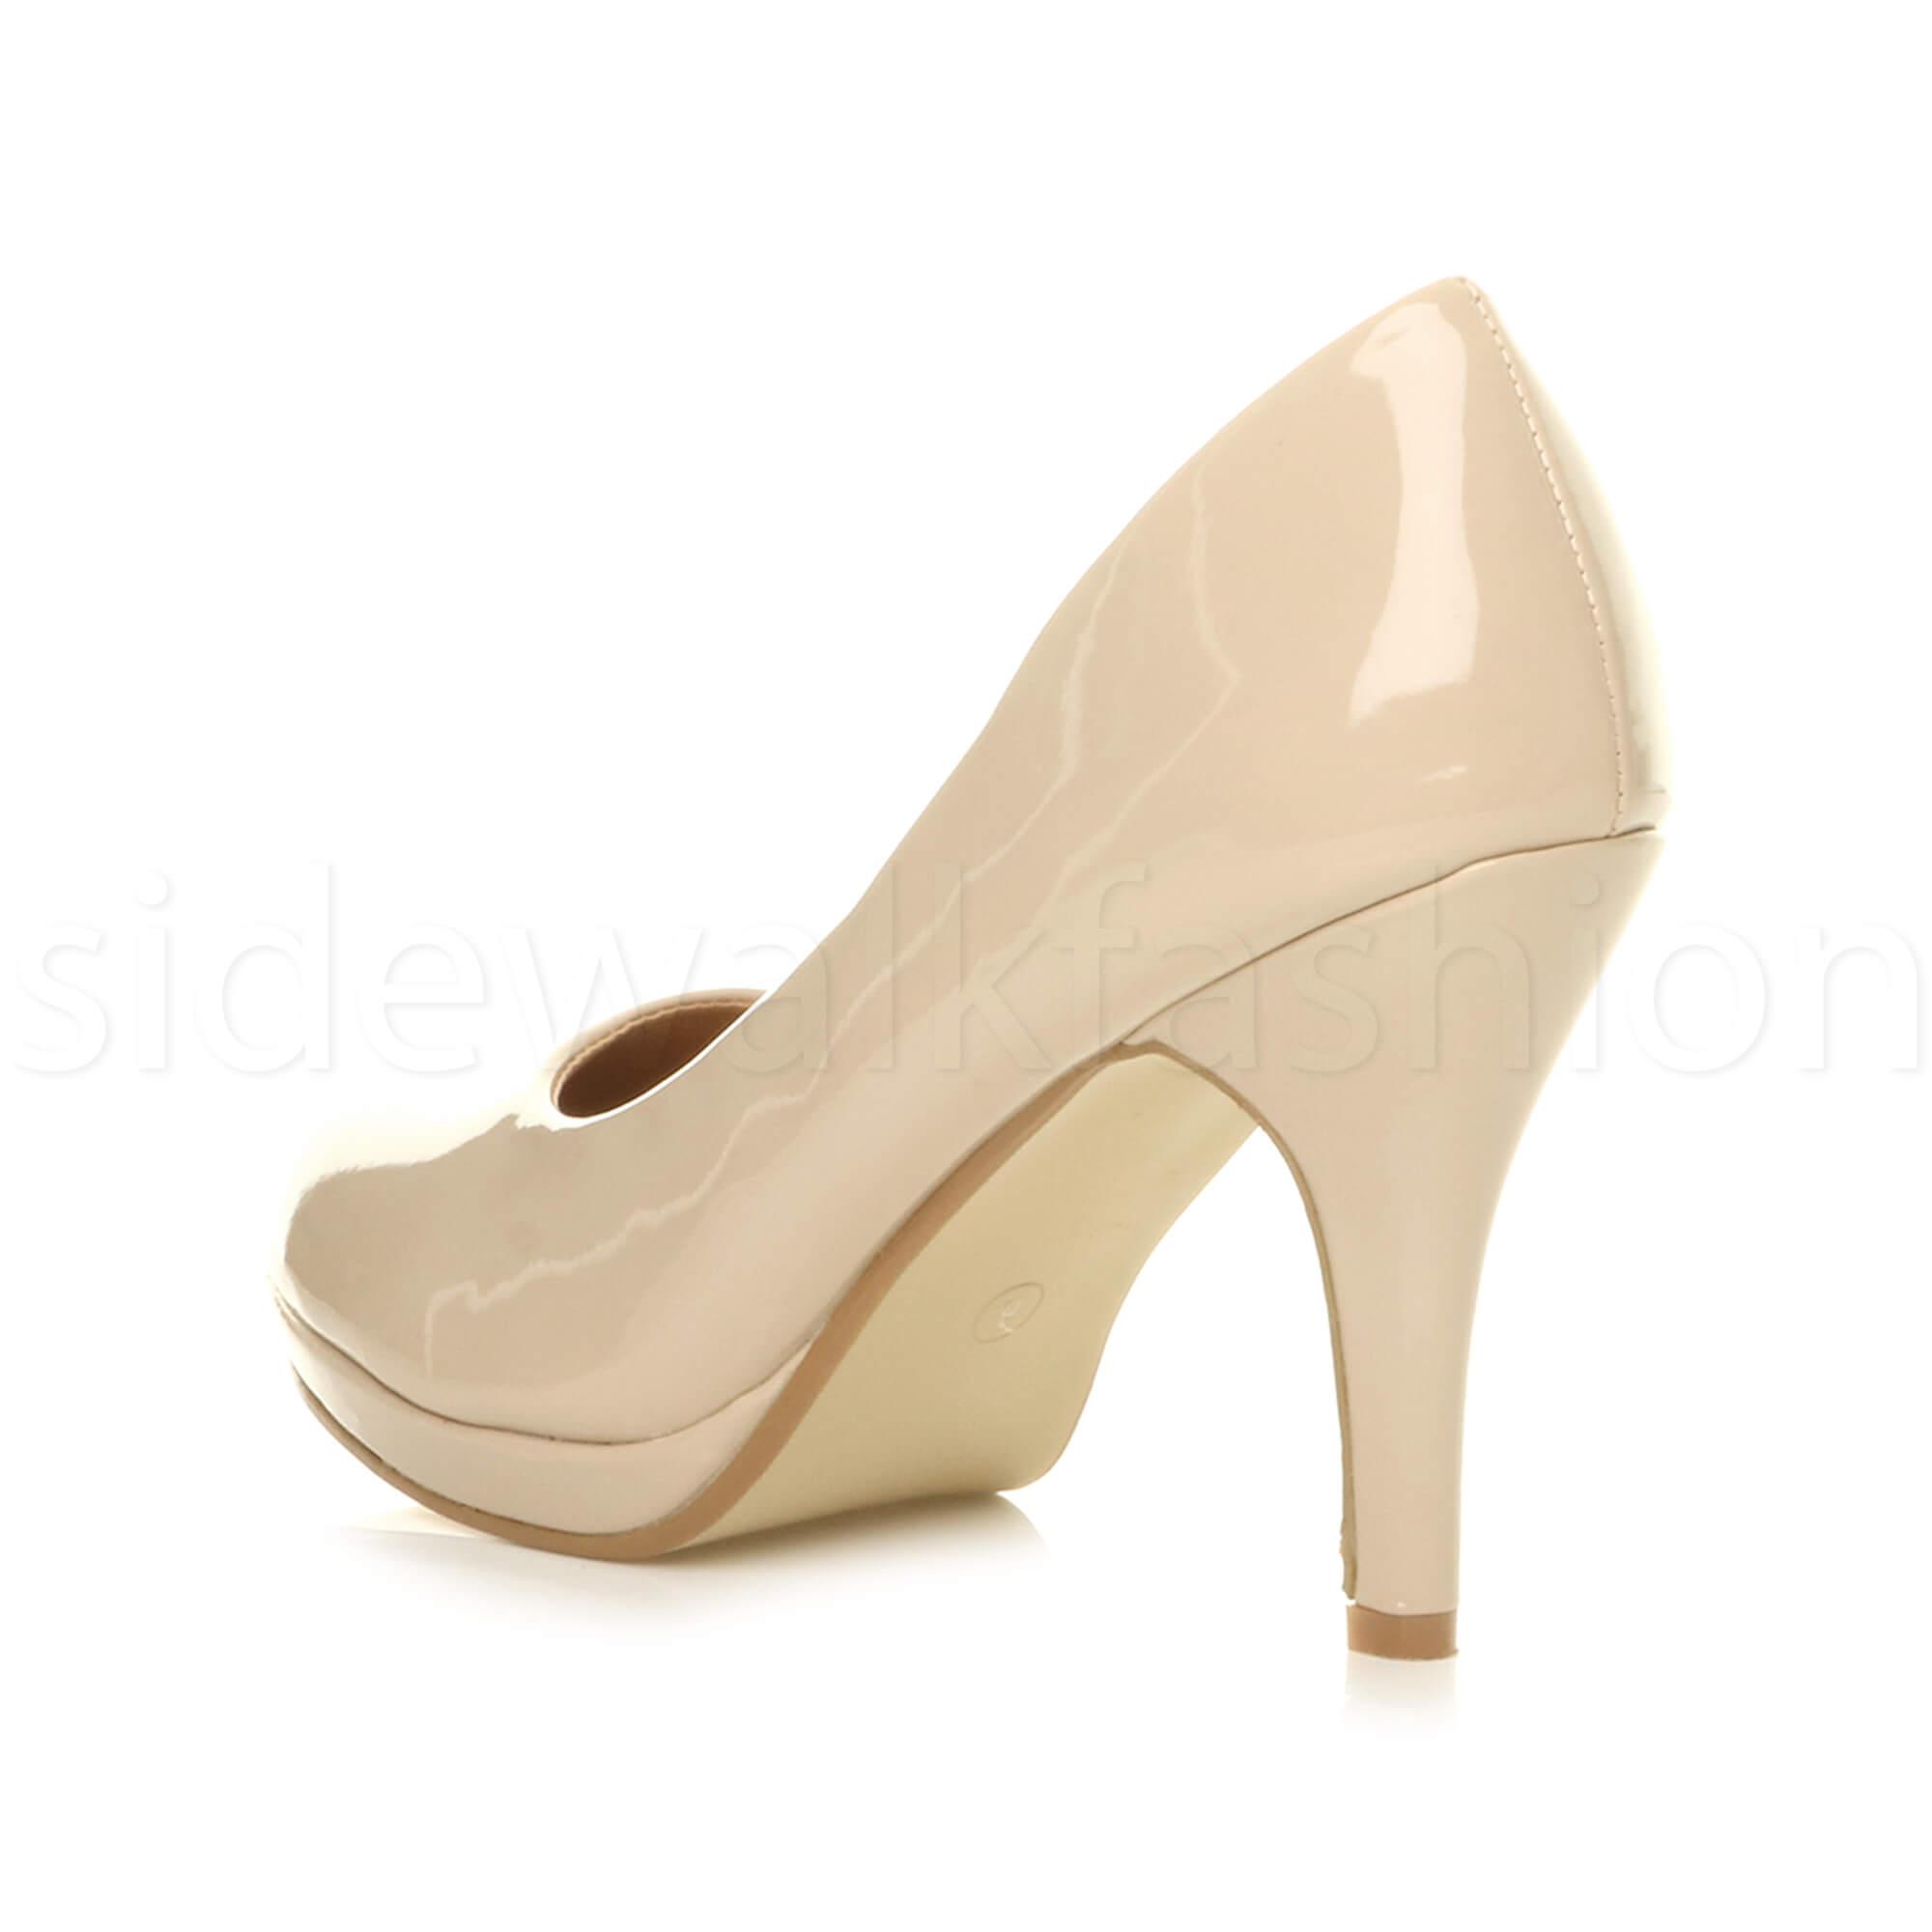 Womens-ladies-high-mid-heel-platform-wedding-evening-bridesmaid-court-shoes-size thumbnail 124